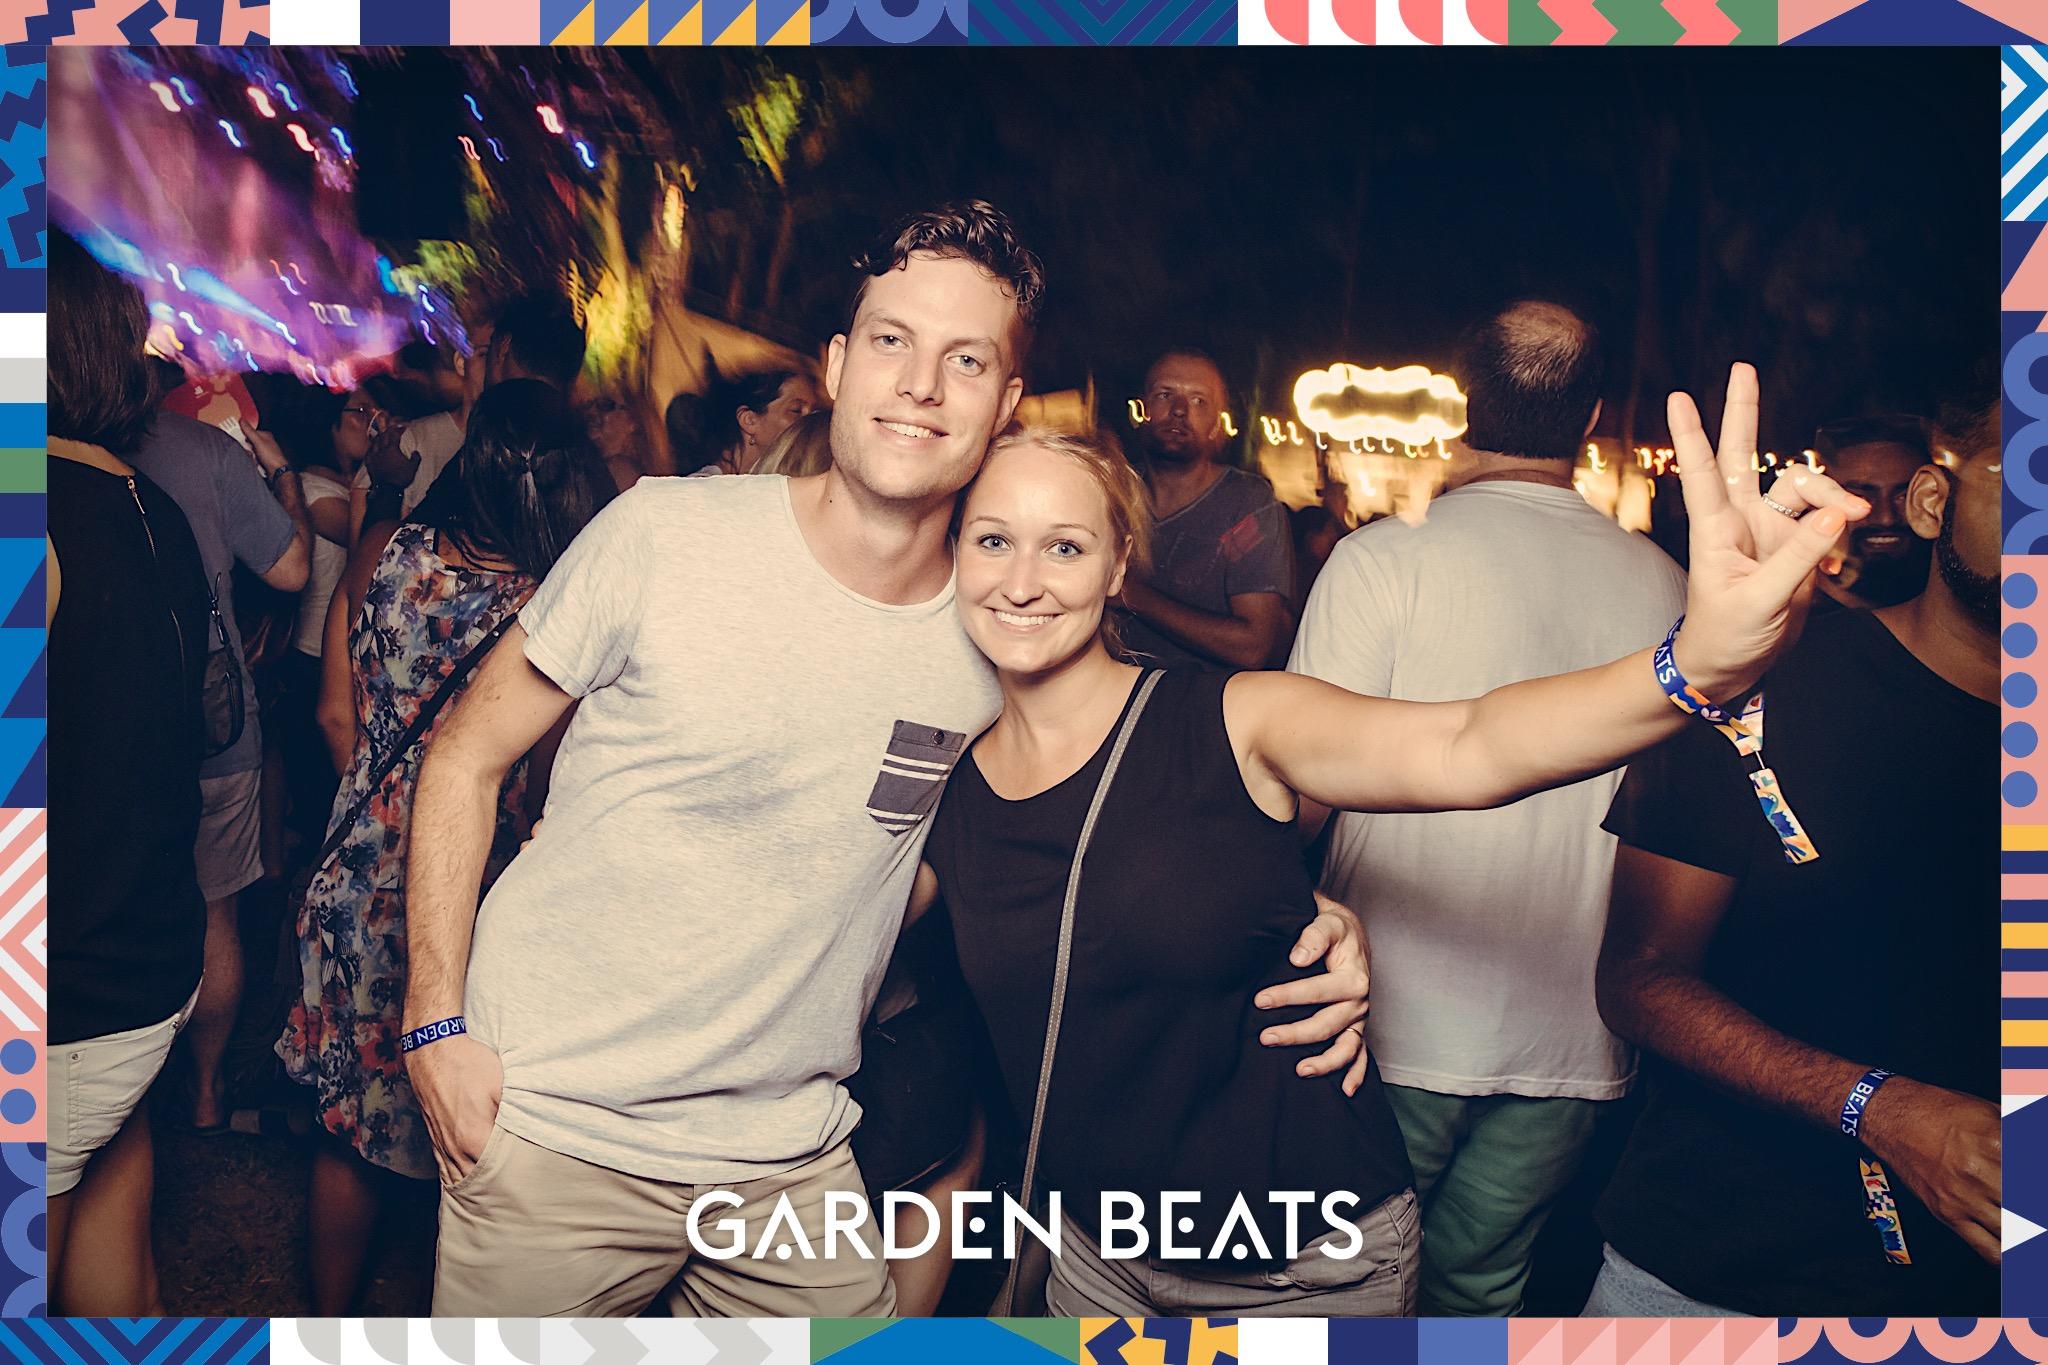 18032017_GardenBeats_Colossal860_WatermarkedGB.jpg